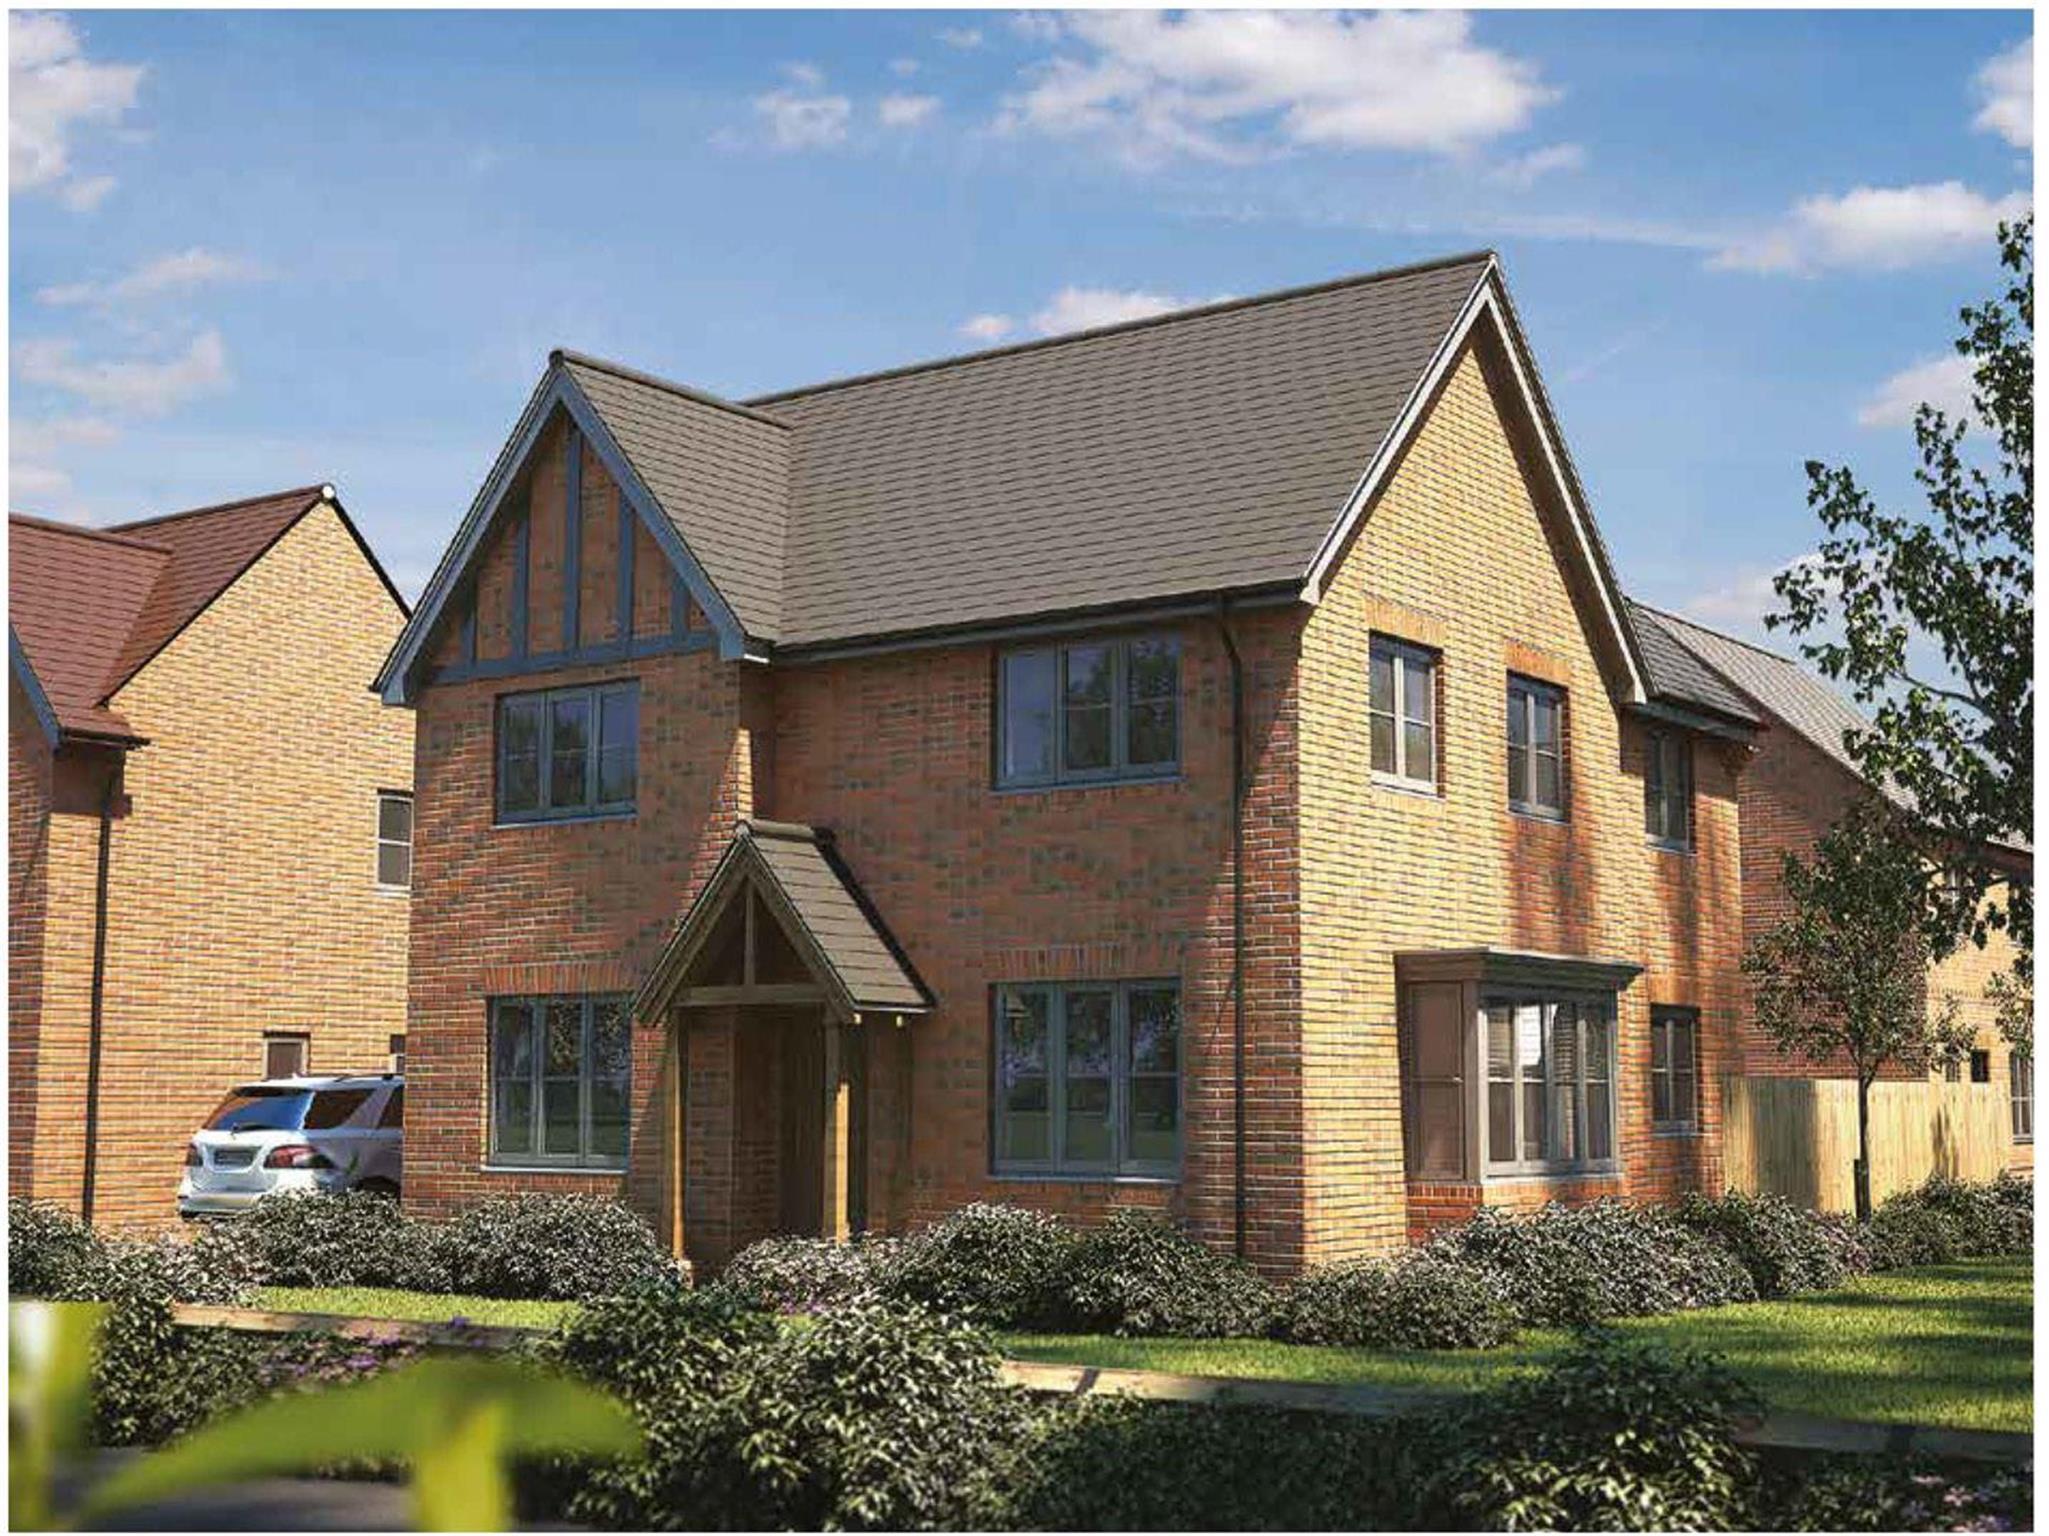 Plot 6, Sycamore House, Chartist Edge, Staunton, Glos GL19